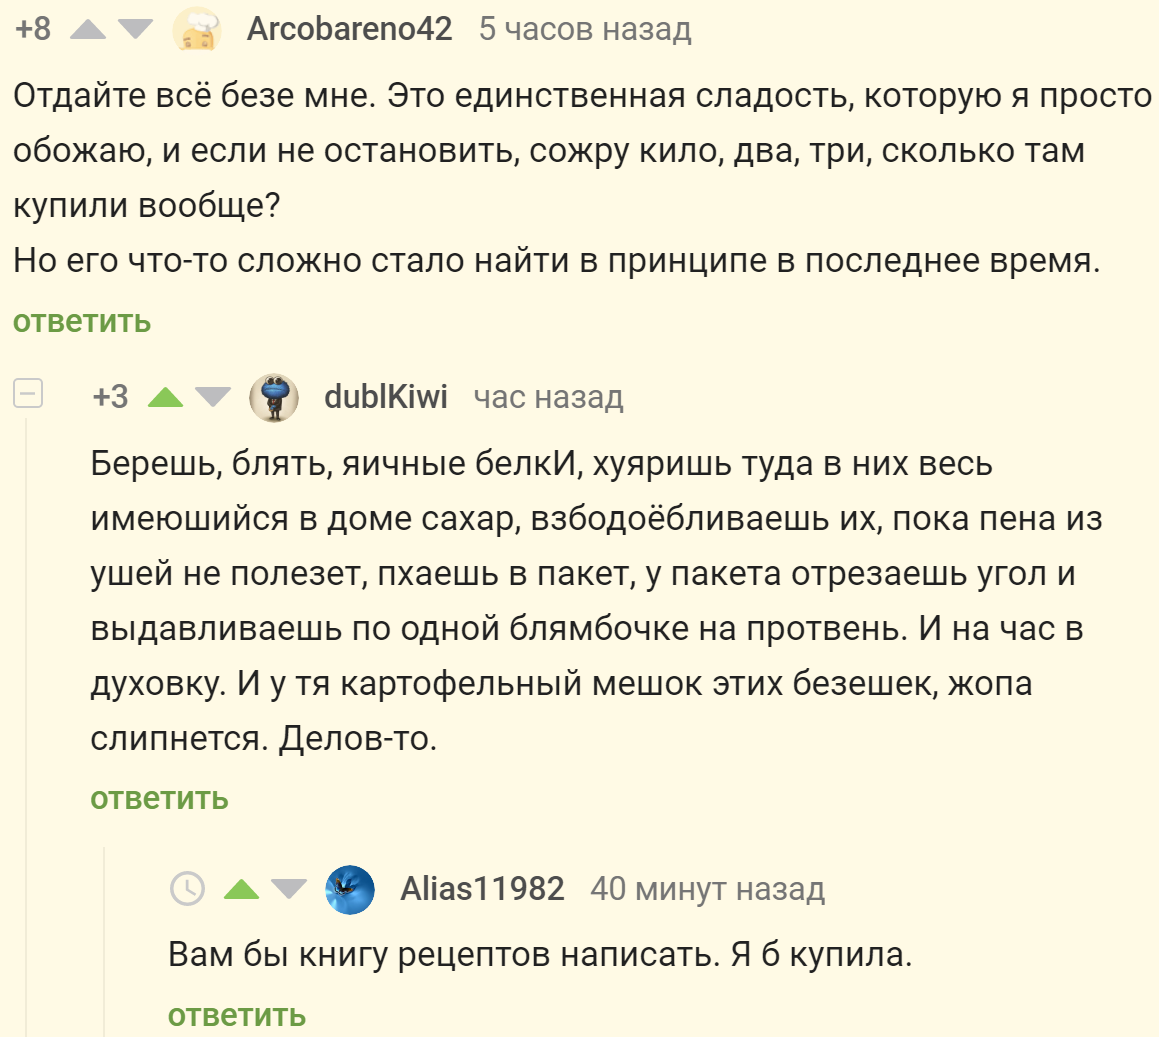 https://cs14.pikabu.ru/post_img/big/2021/03/29/7/1617012010197113421.png